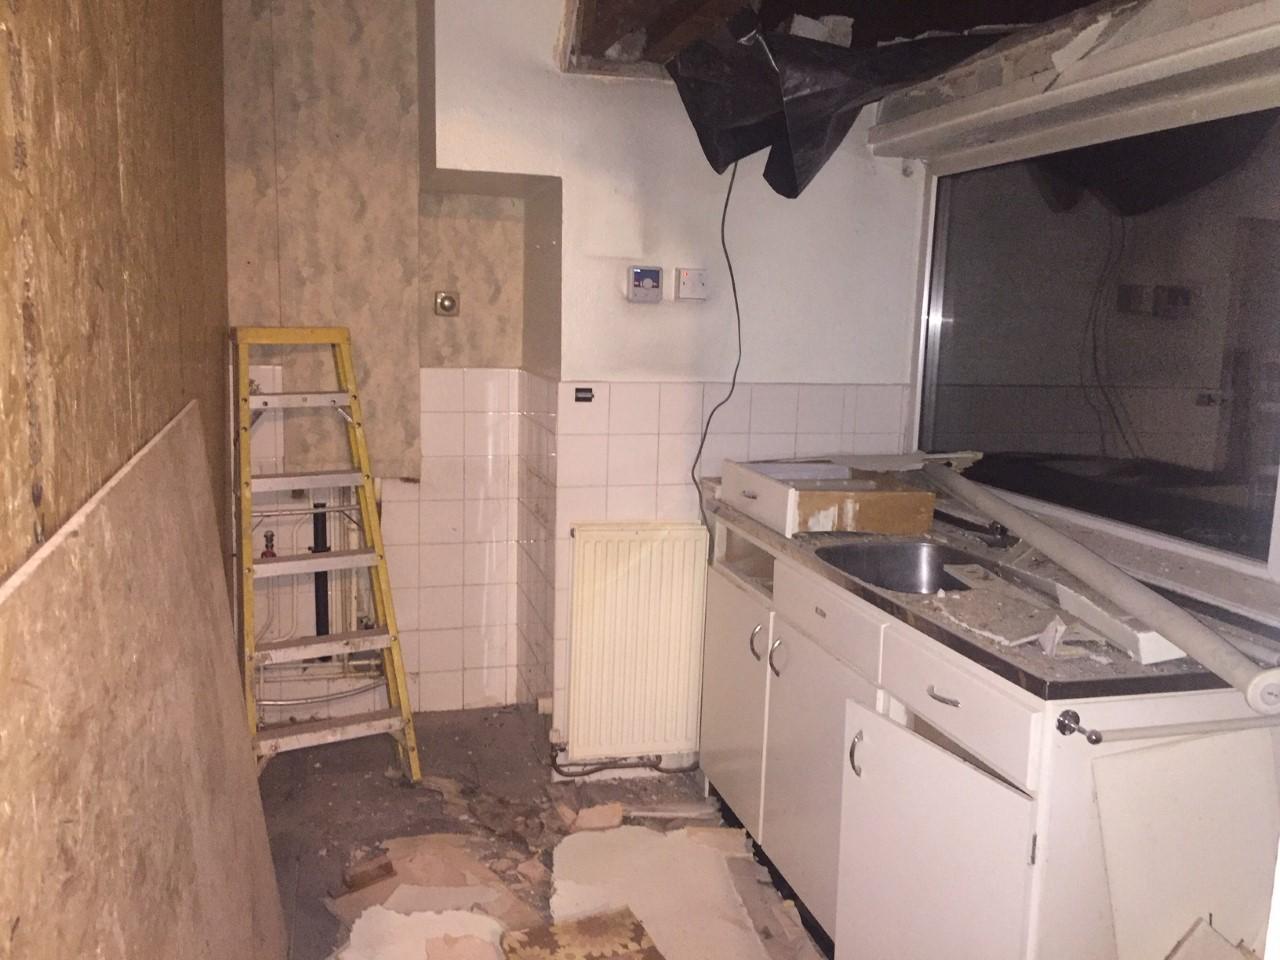 Renovation of a Bristol kitchen